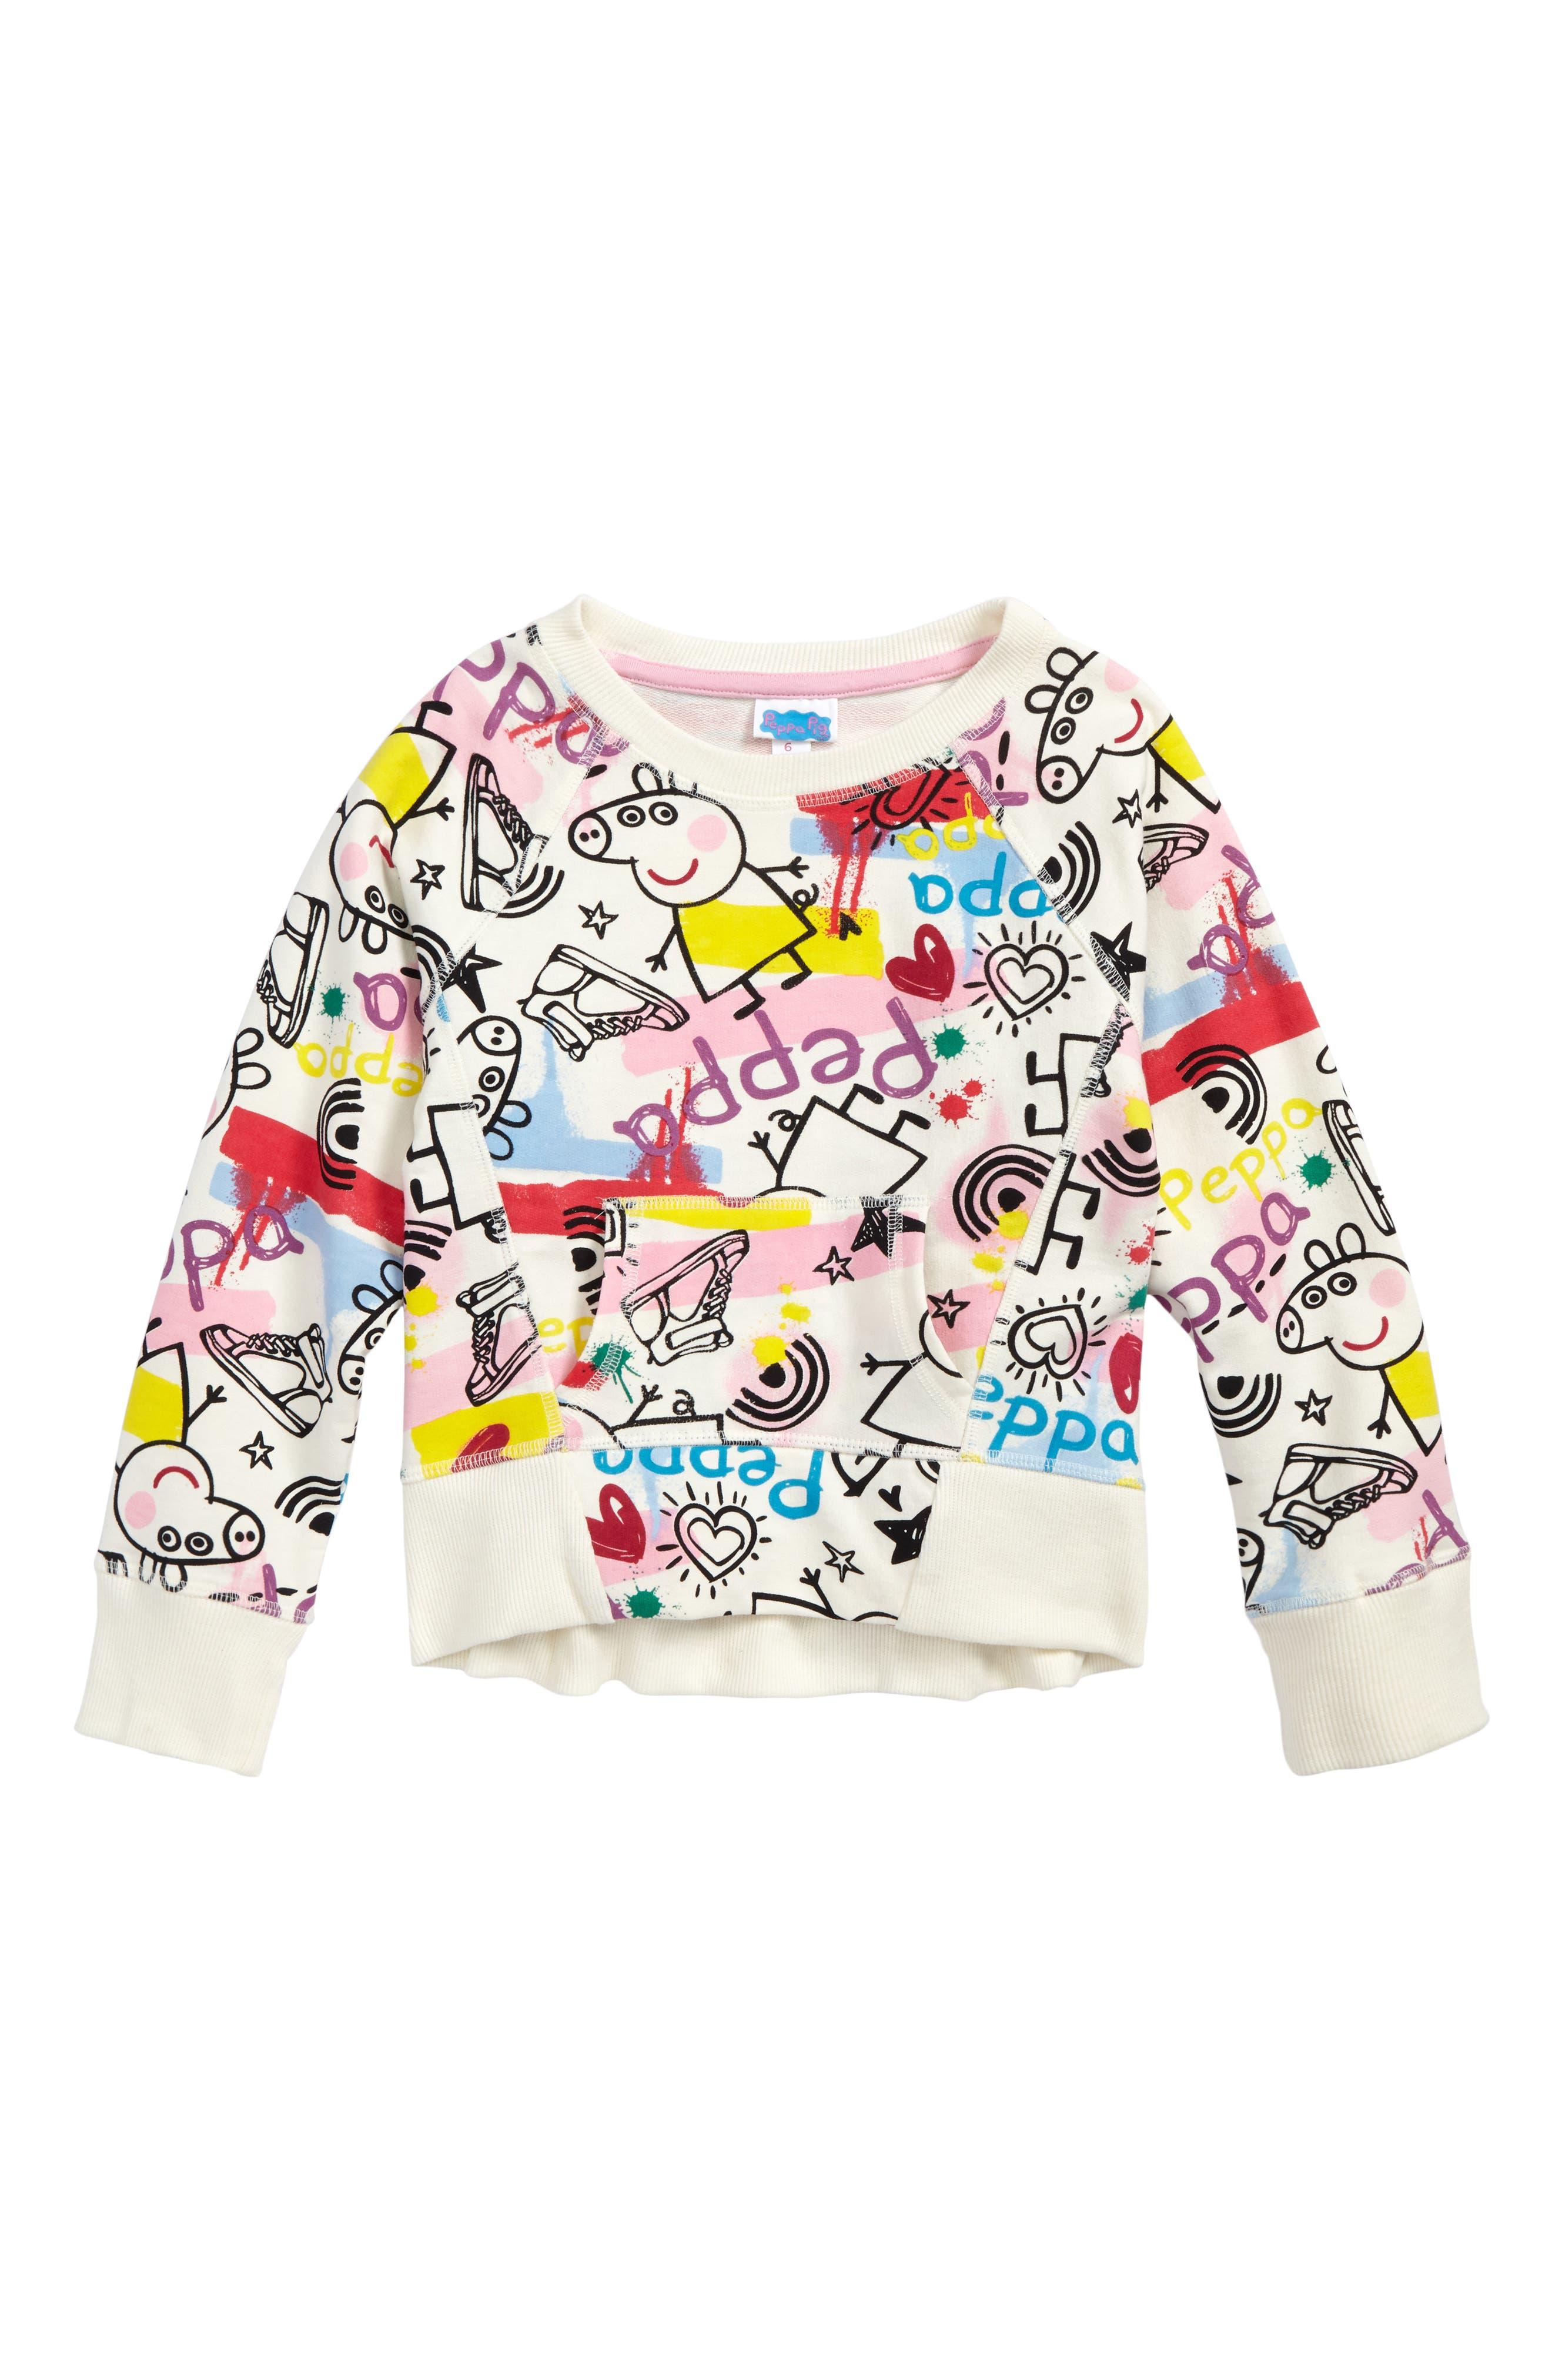 Main Image - Happy Threads Peppa Pig Graphic Sweatshirt (Toddler Girls & Little Girls)